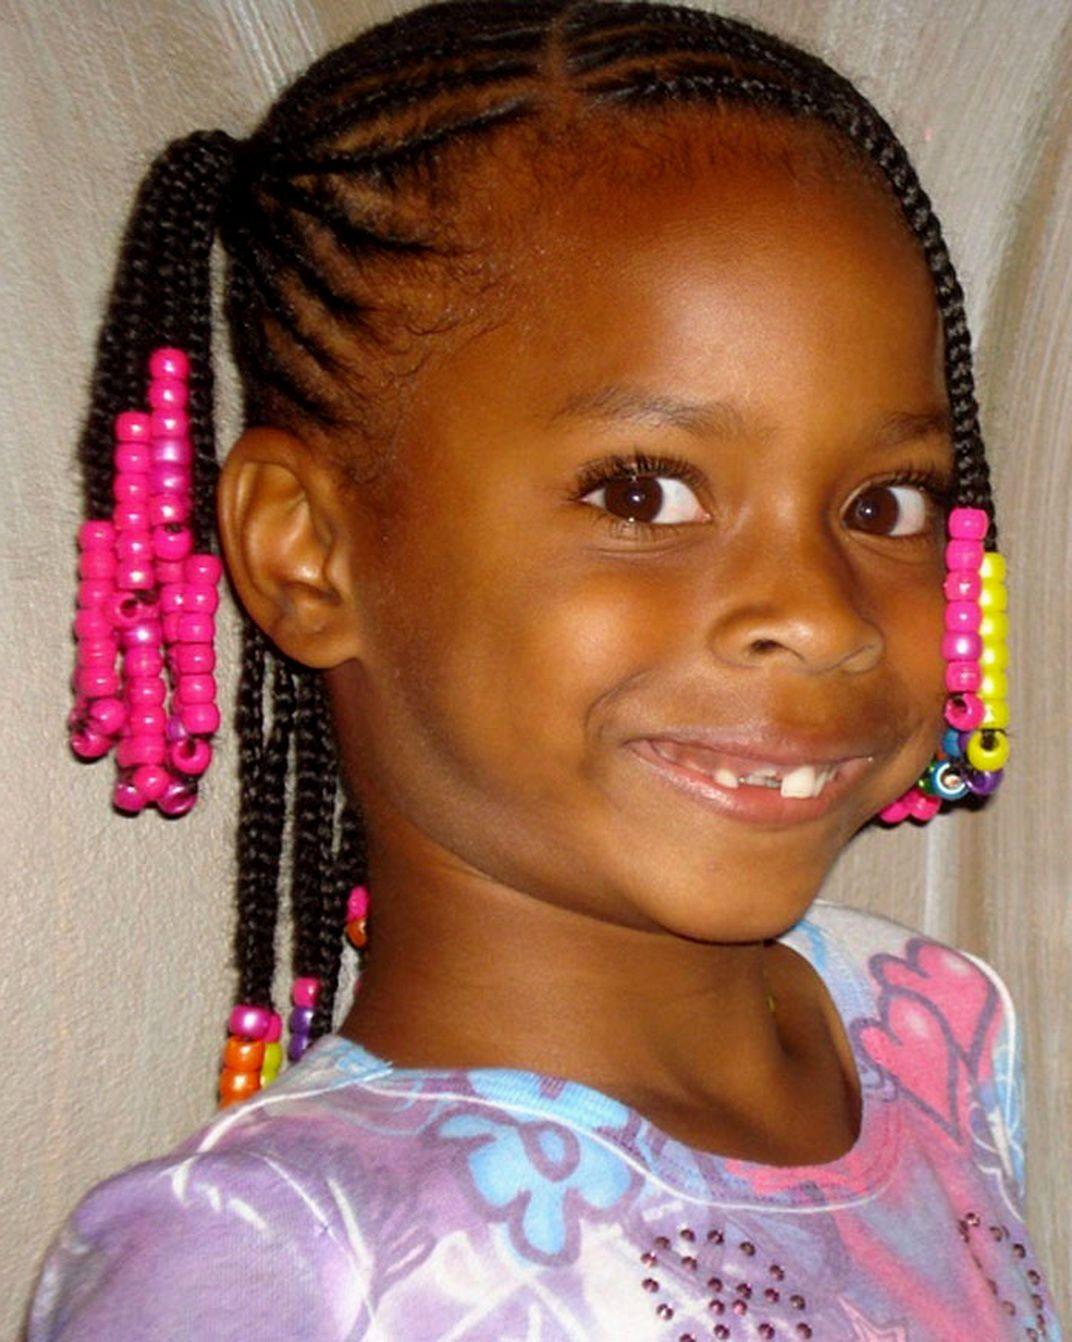 Cute Hairstyles Little Black Girls Hair Styles Kids Braided Hairstyles Short Hair Black